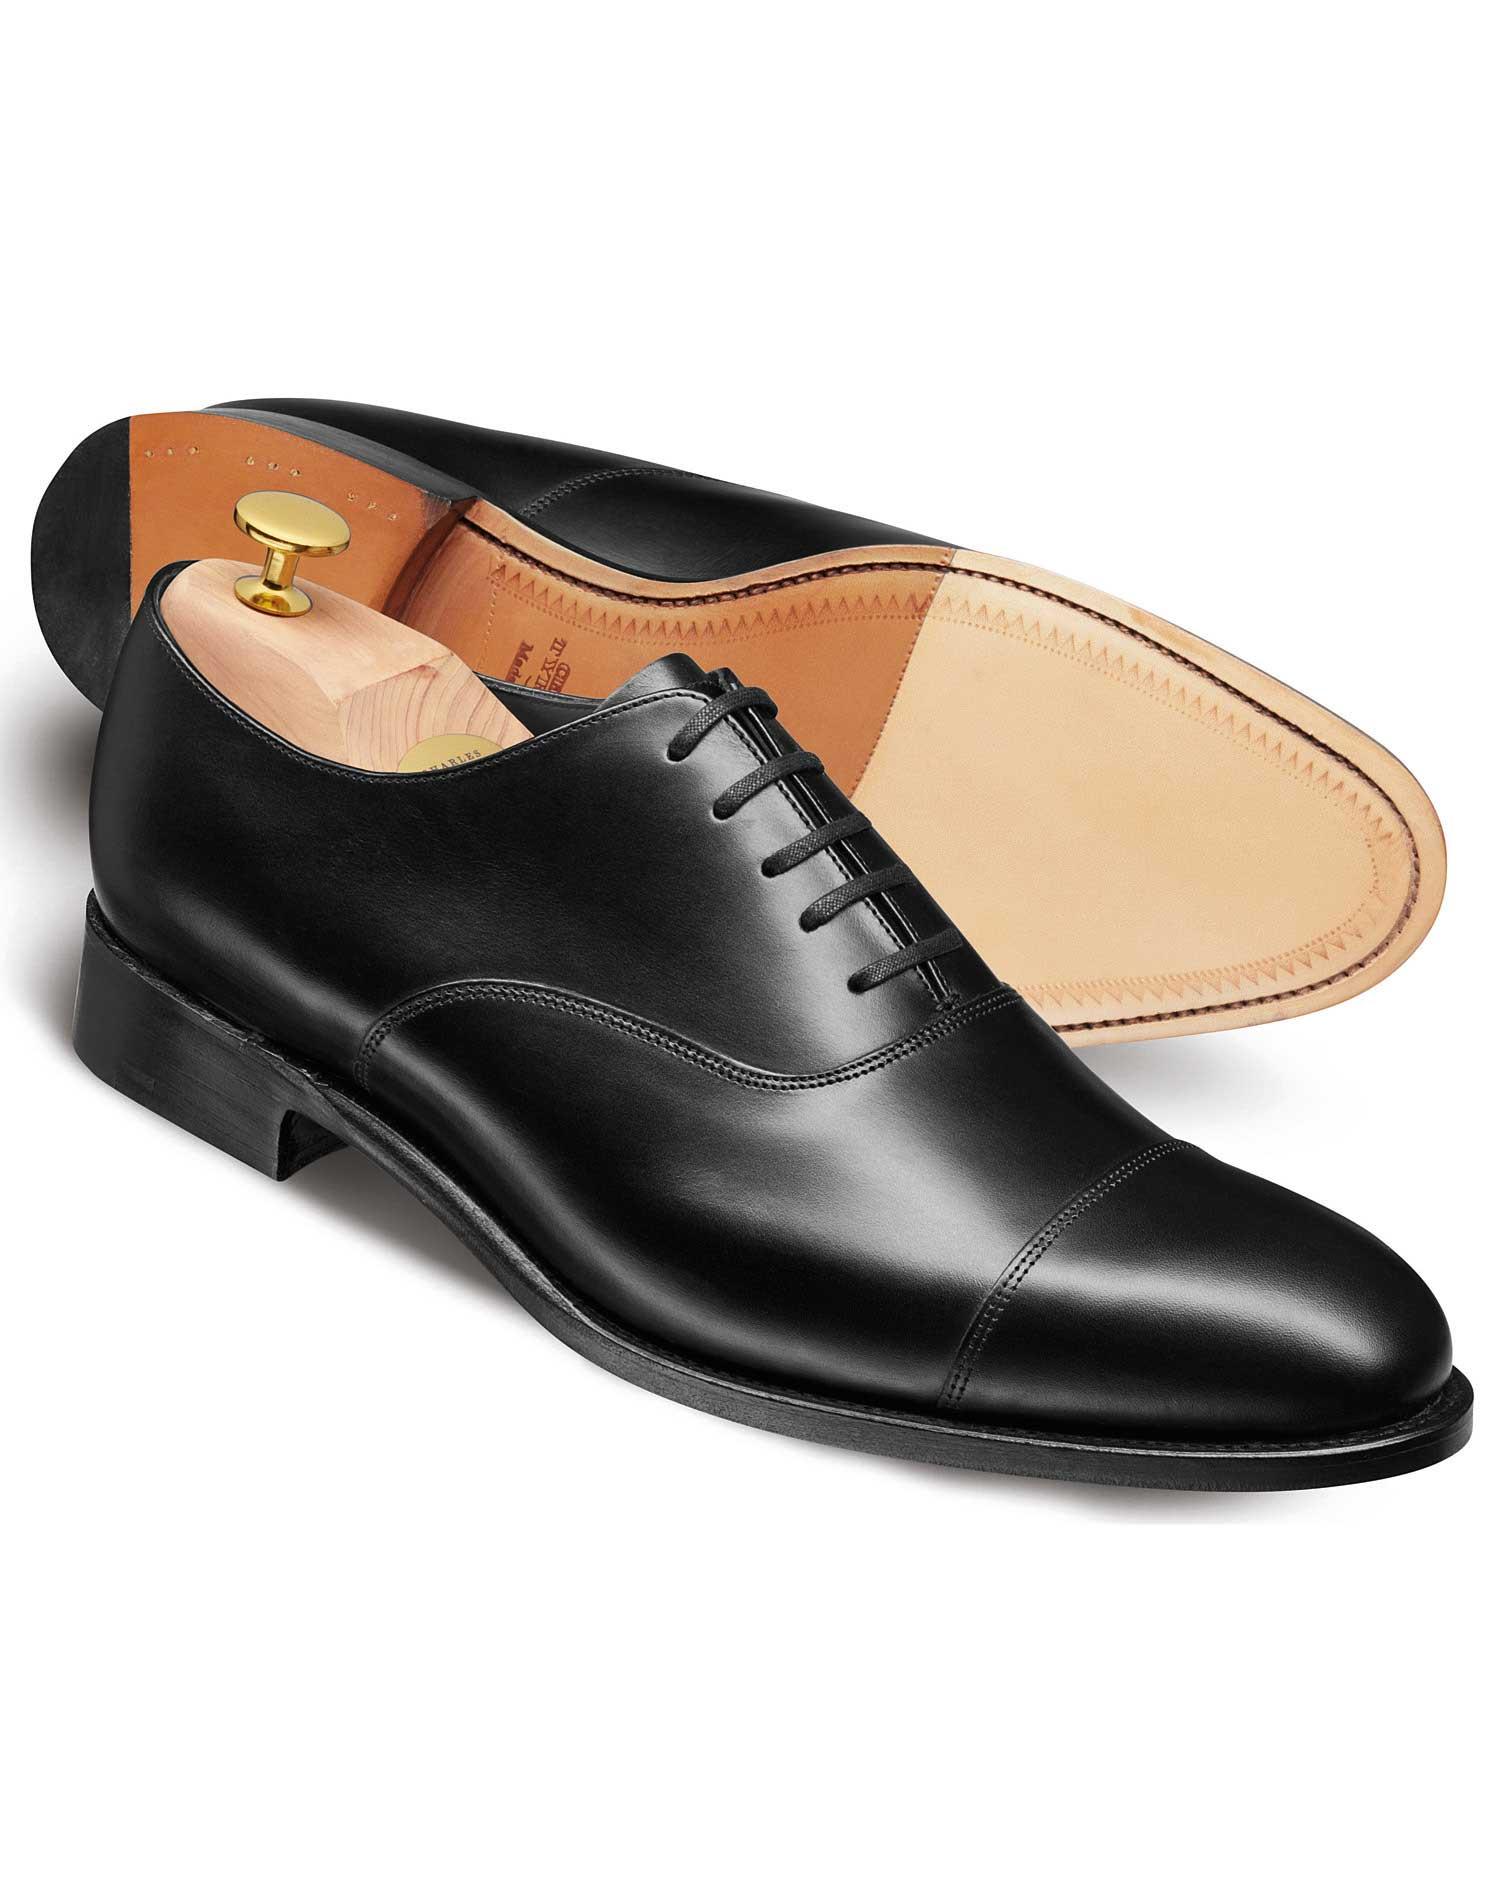 England Oxford toe cap shoes